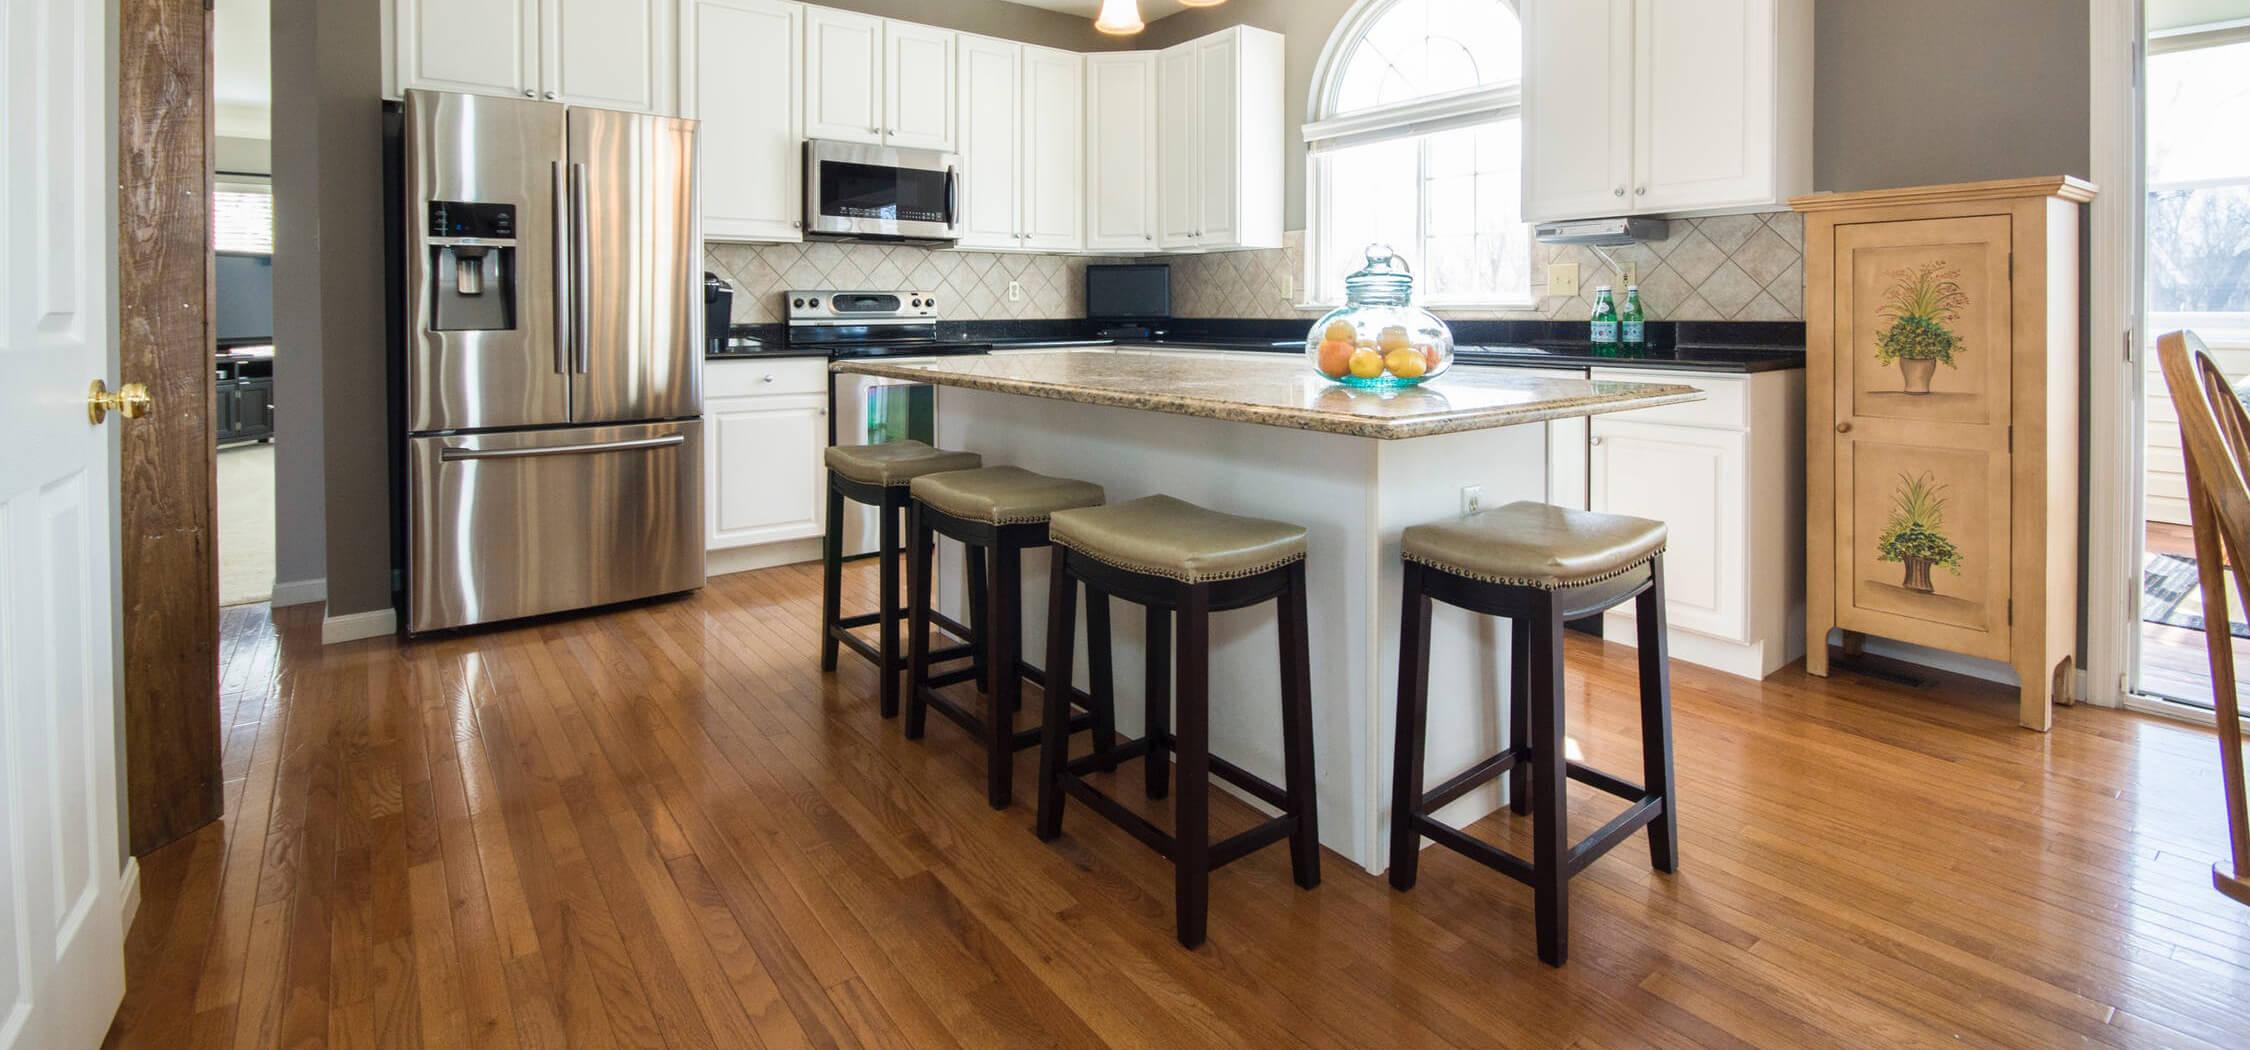 what-is-the-best-pet-friendly-flooring-6.jpeg